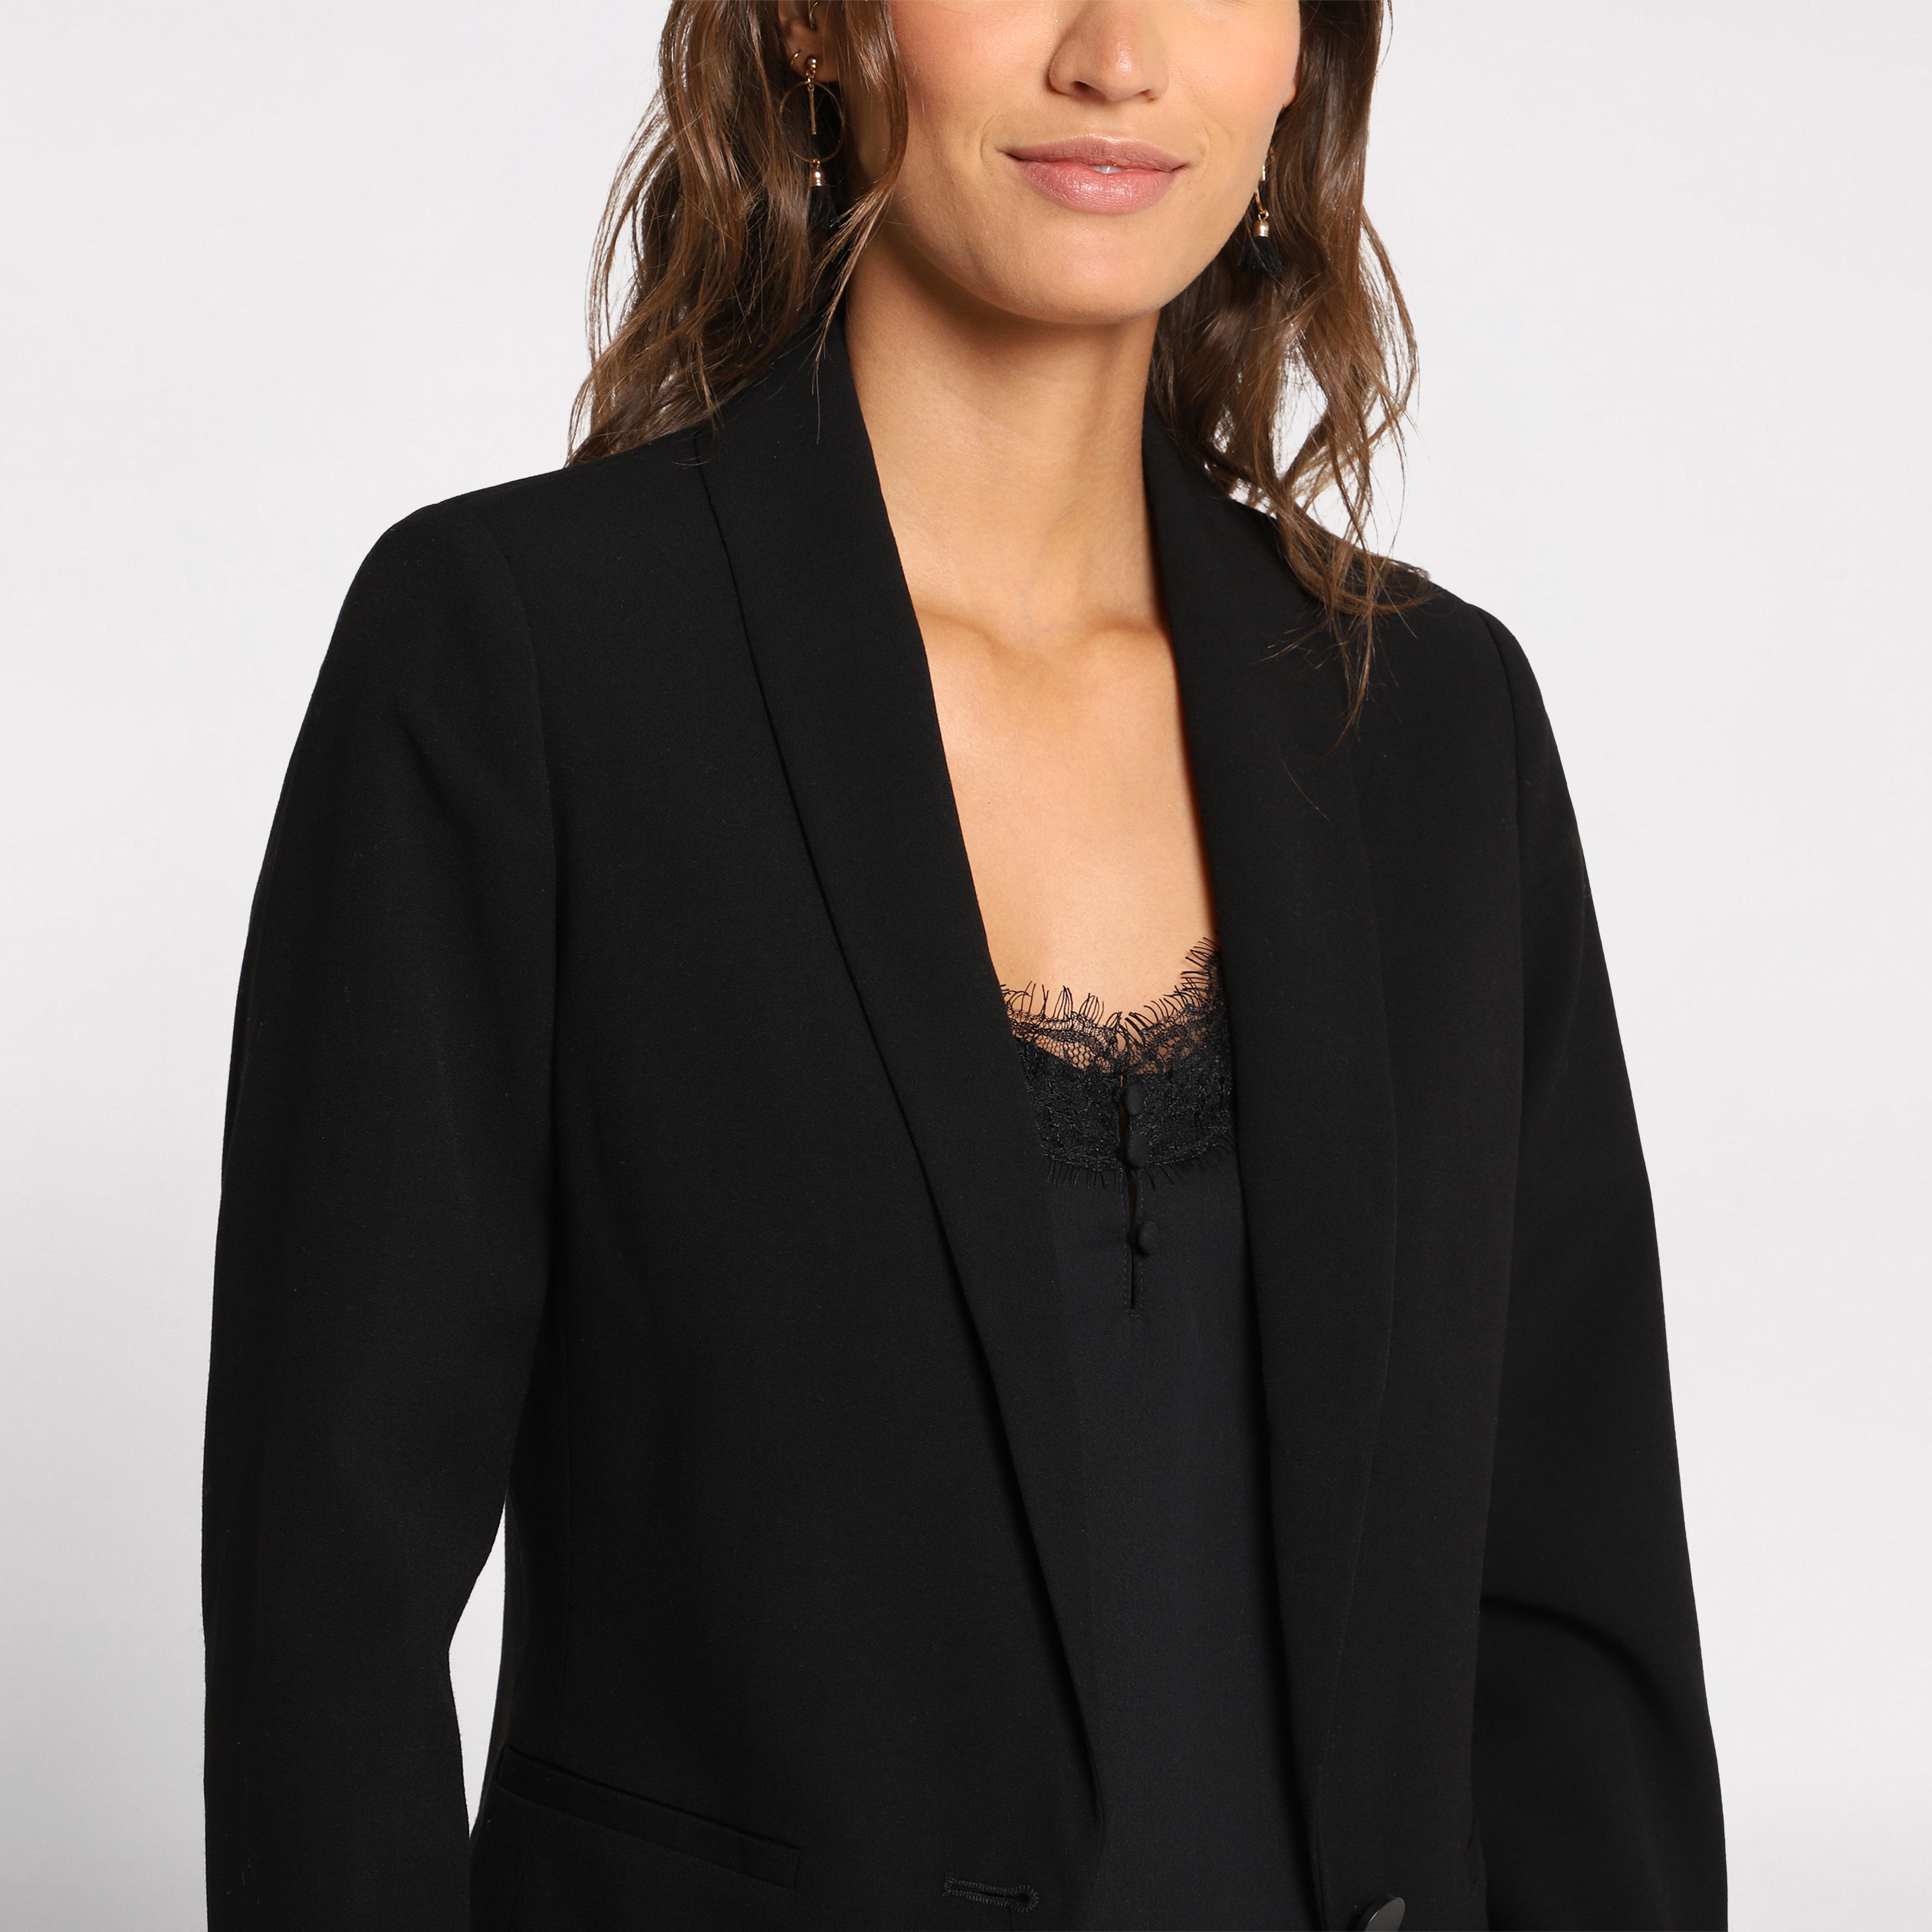 536cee4f4bb5b Veste blazer cintrée noir femme | Vib's